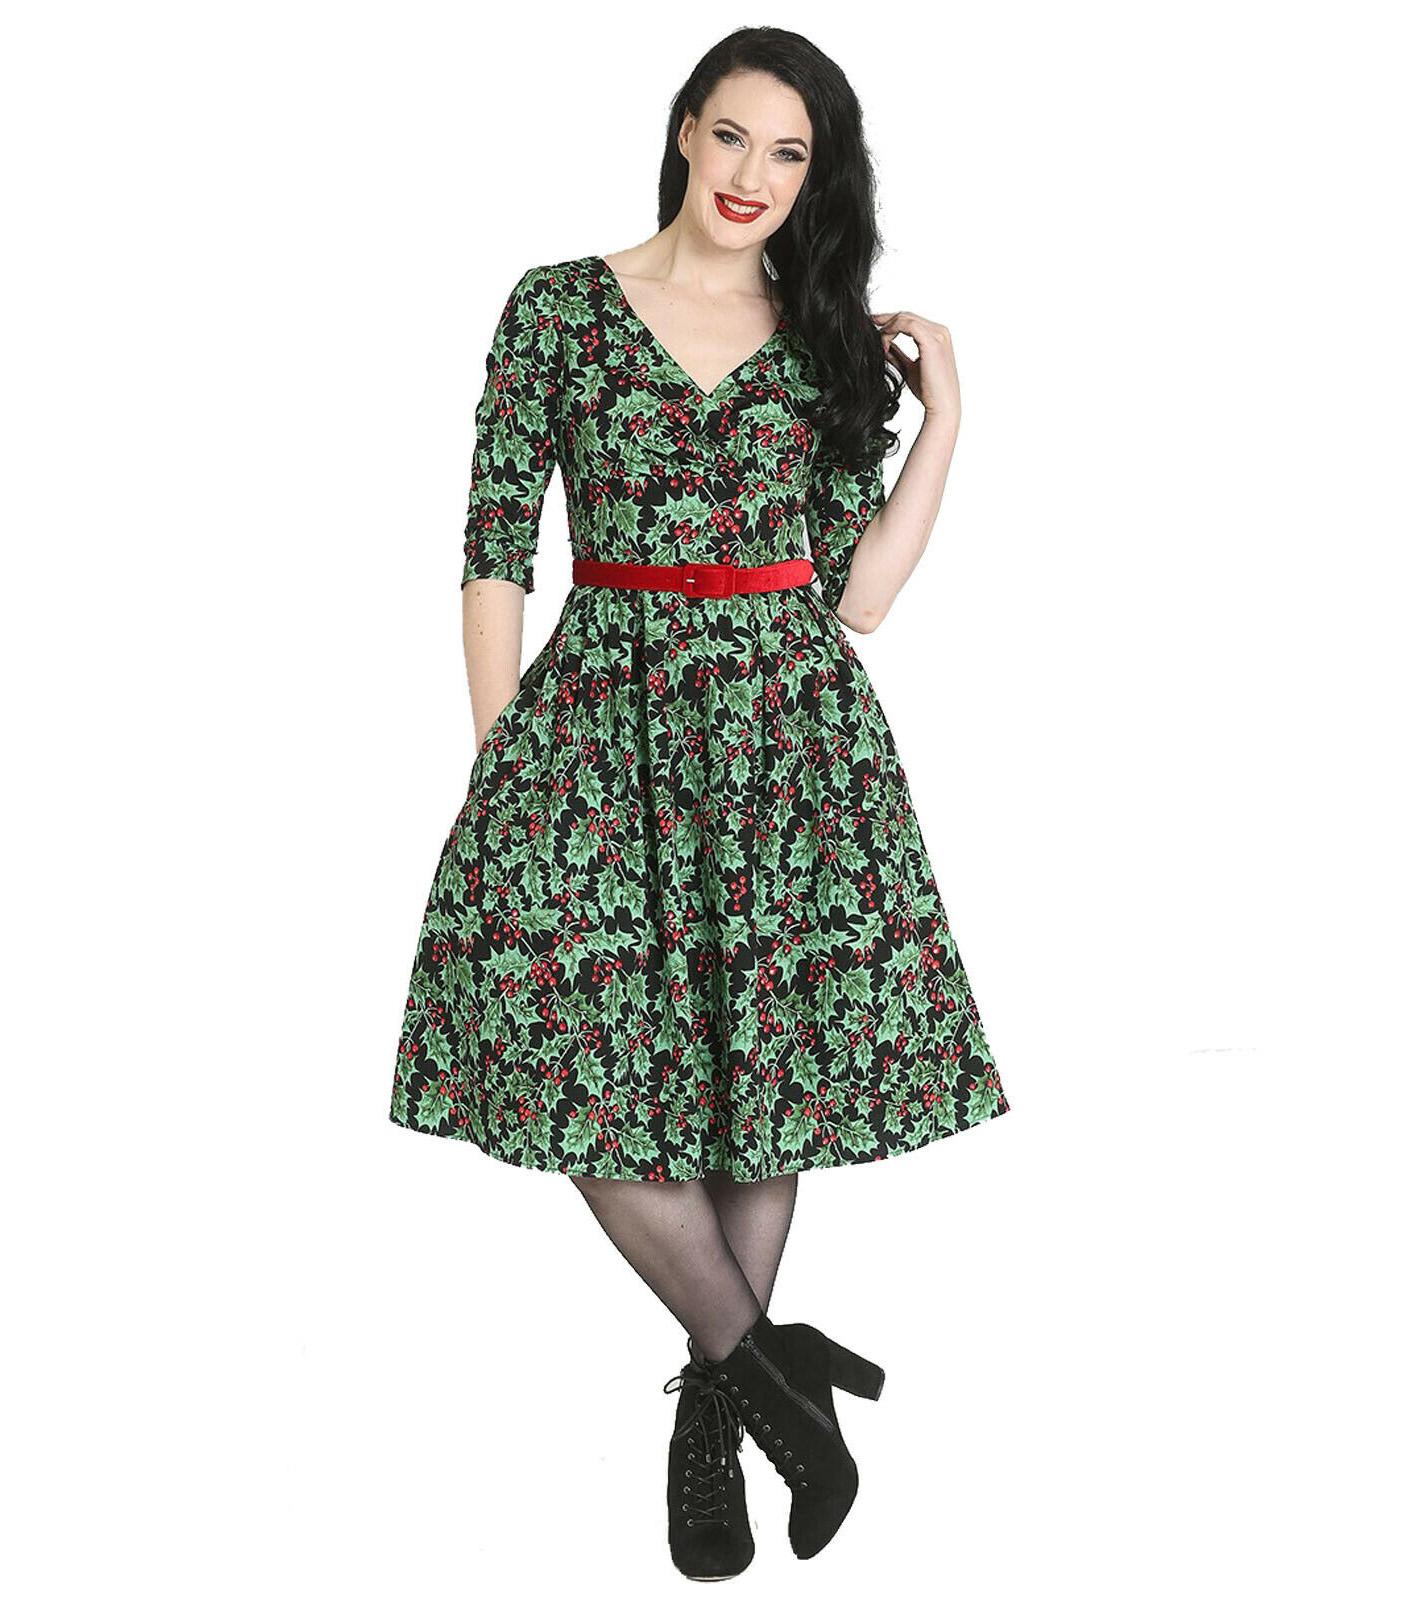 Hell-Bunny-50s-Pin-Up-Navidad-Vestido-Festivo-Rojo-Holly-Berry-Negro-Todos-los-Tamanos miniatura 31